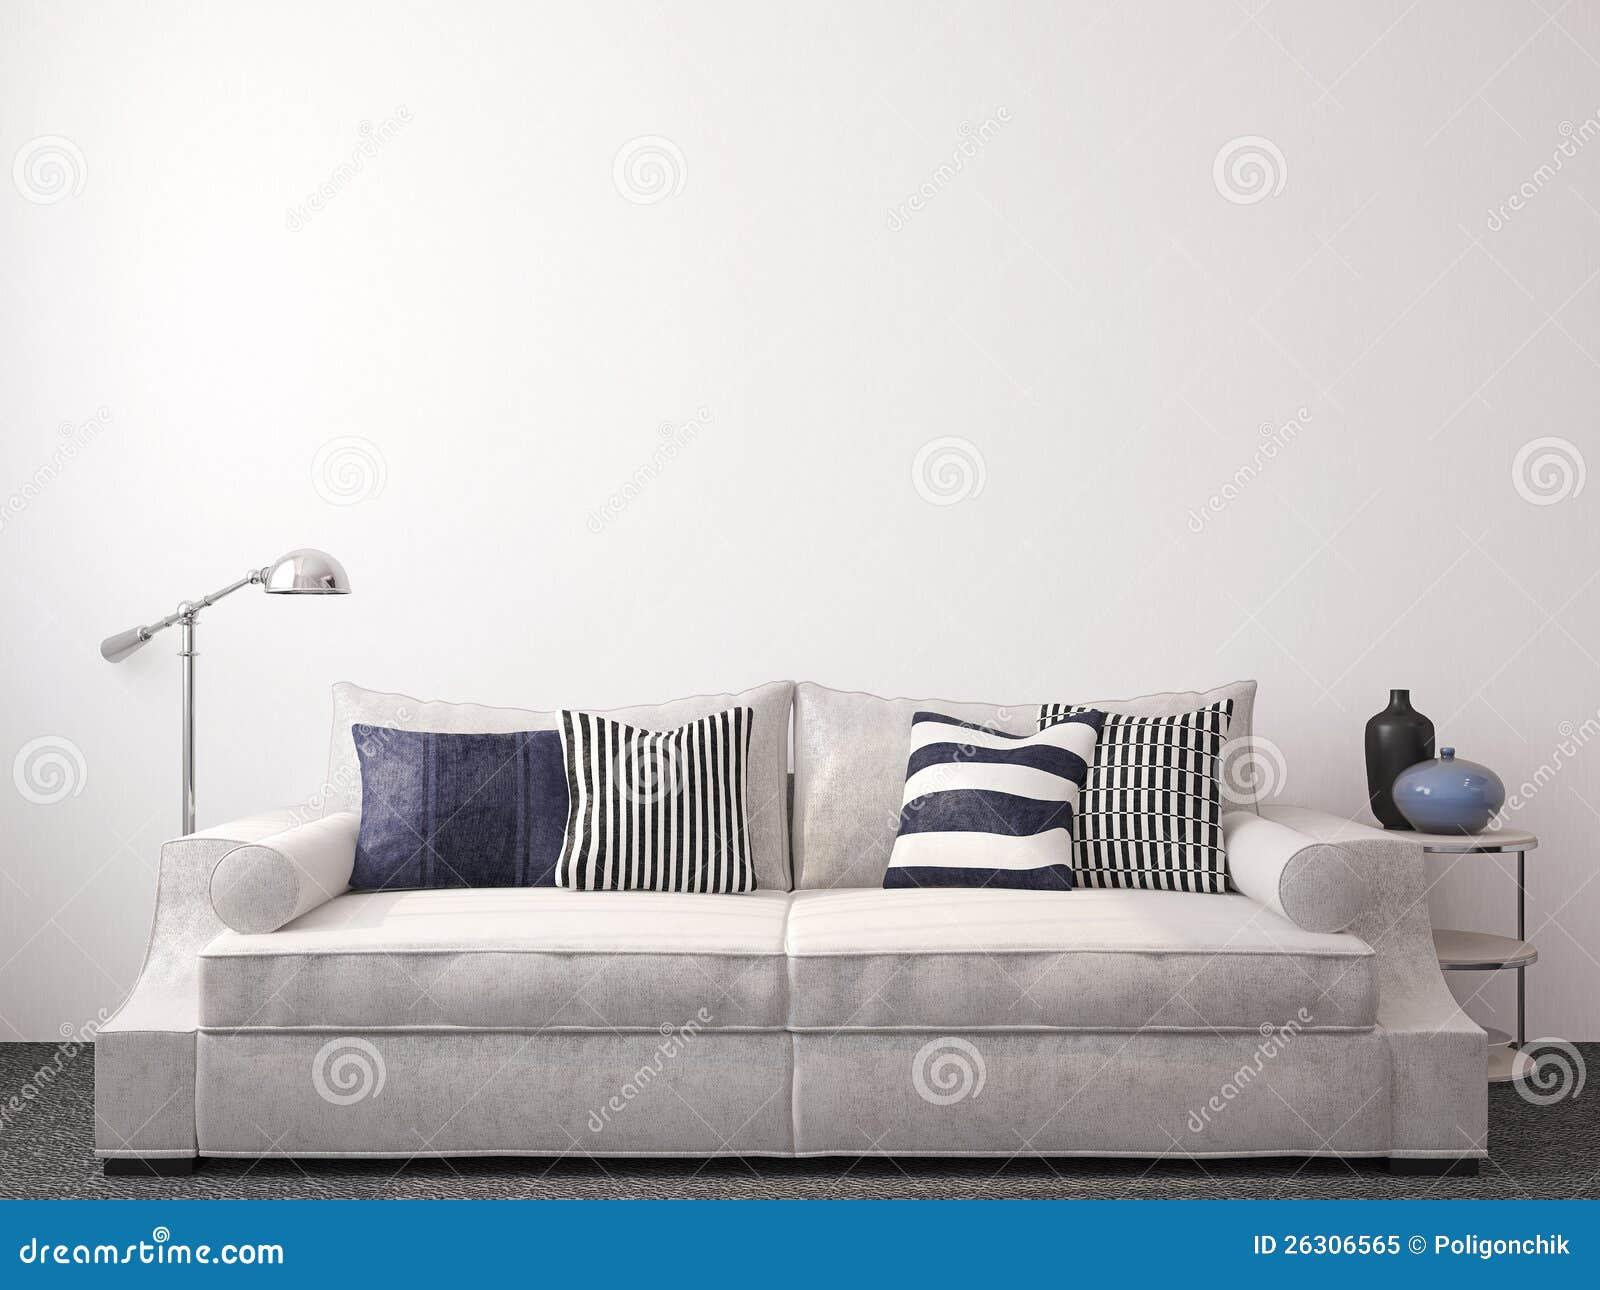 Muur ontwerp woonkamer witte ~ anortiz.com for .